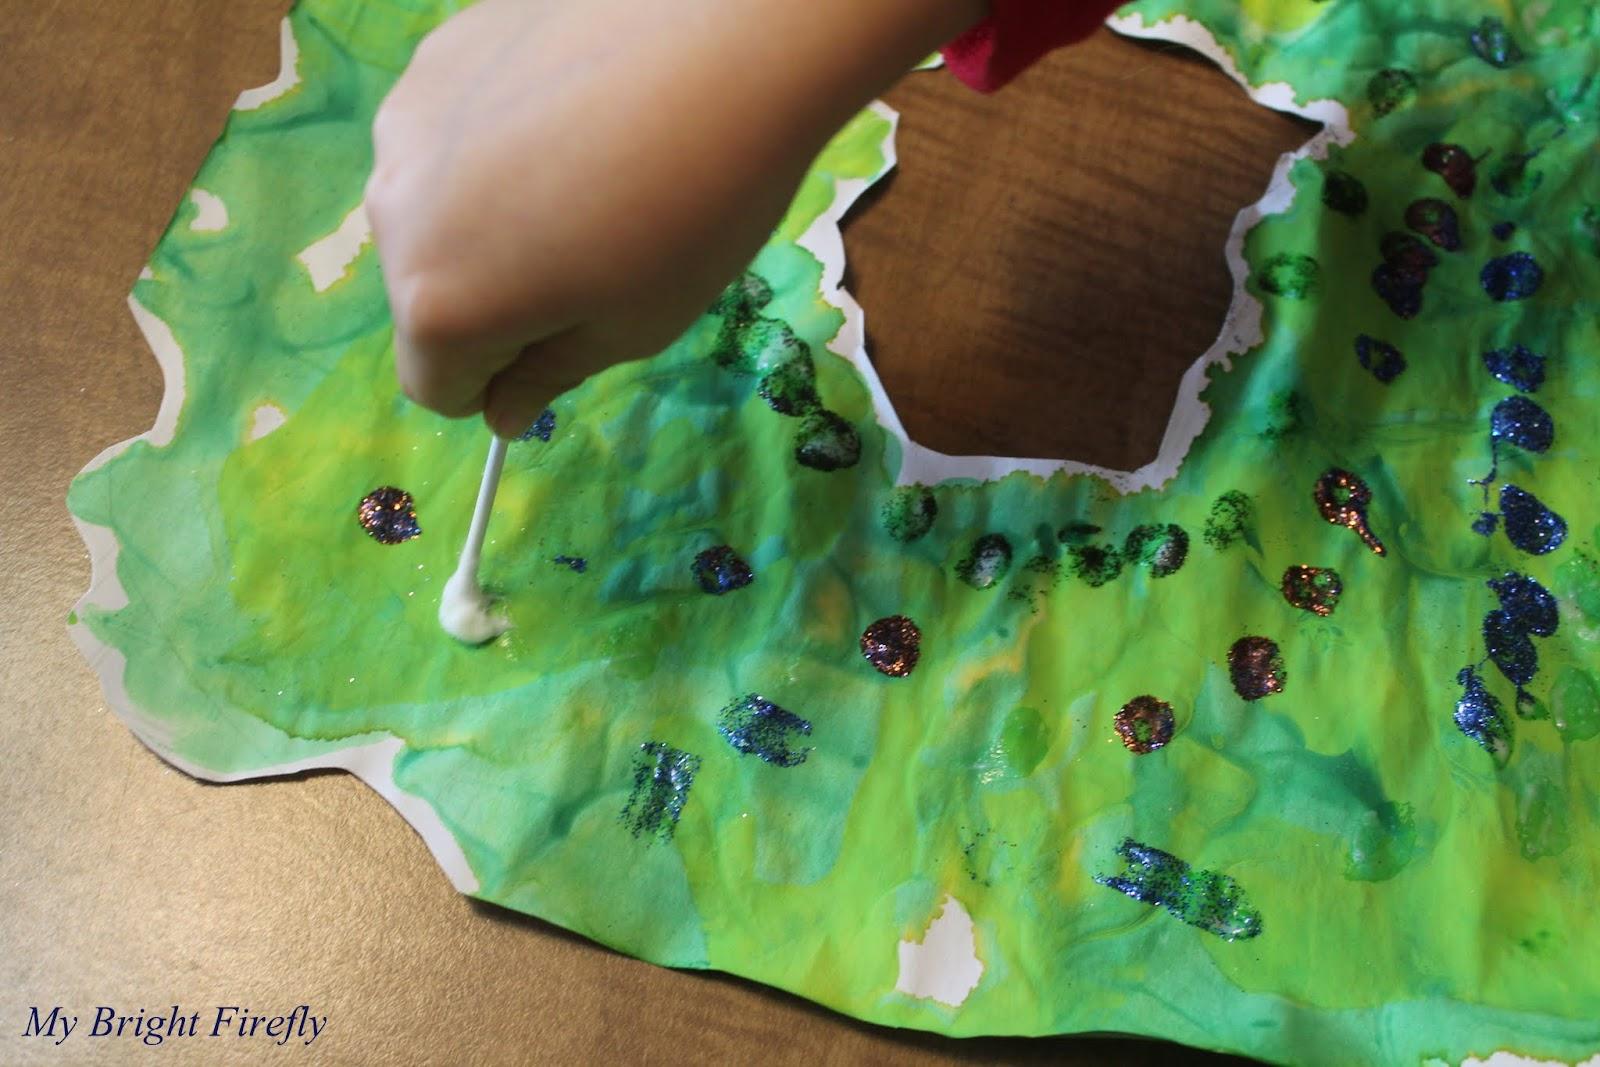 My Bright Firefly: Process Art: Christmas Handprint and Glitter Wreath